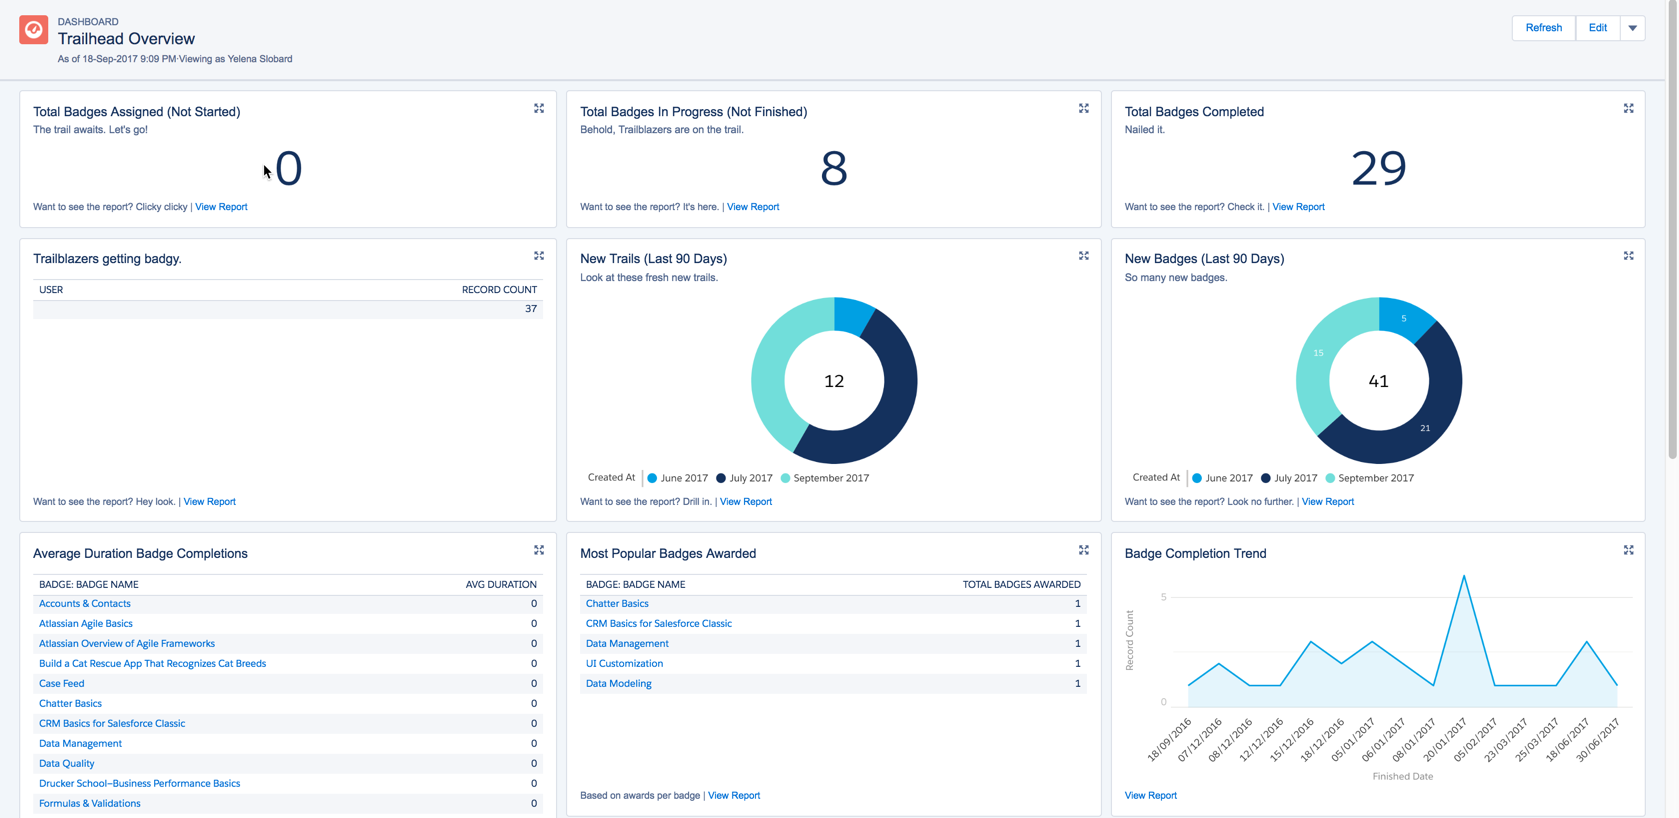 Trailhead Tracker | Salesforce 9 to 5